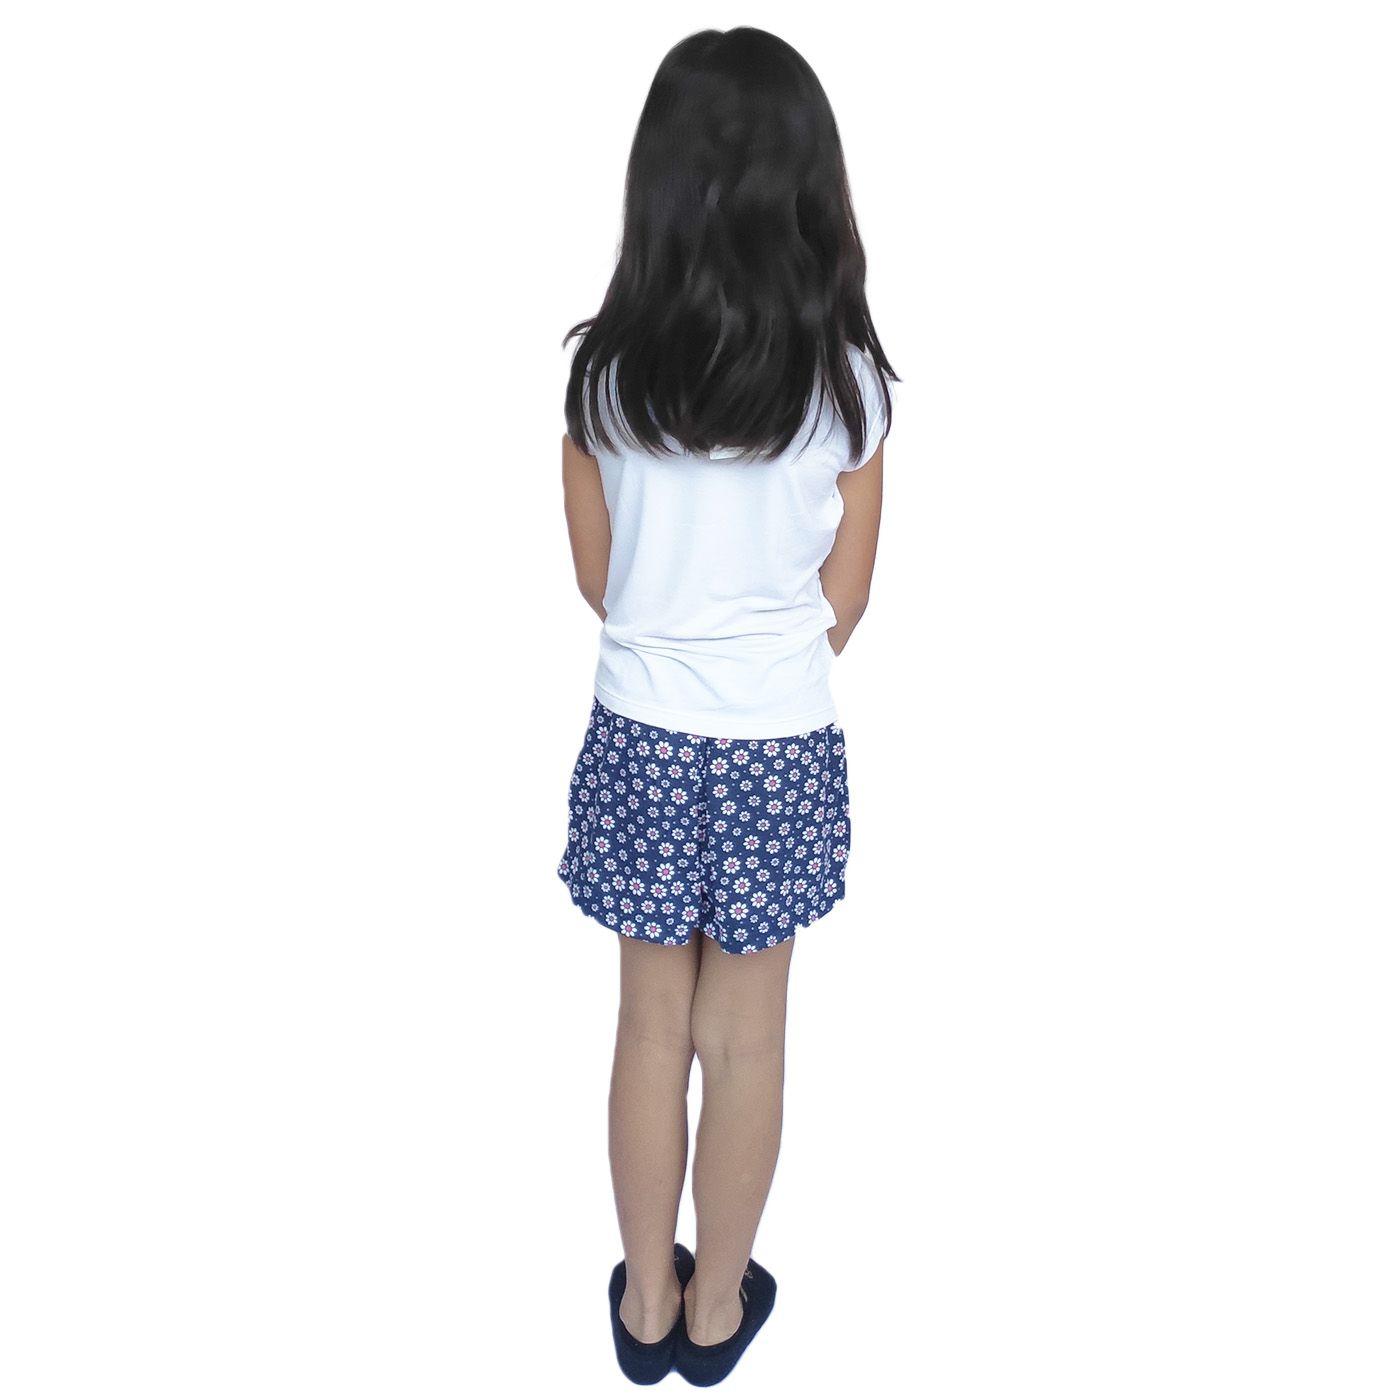 Pijama infantil menina girafa lacinho short blusa manga